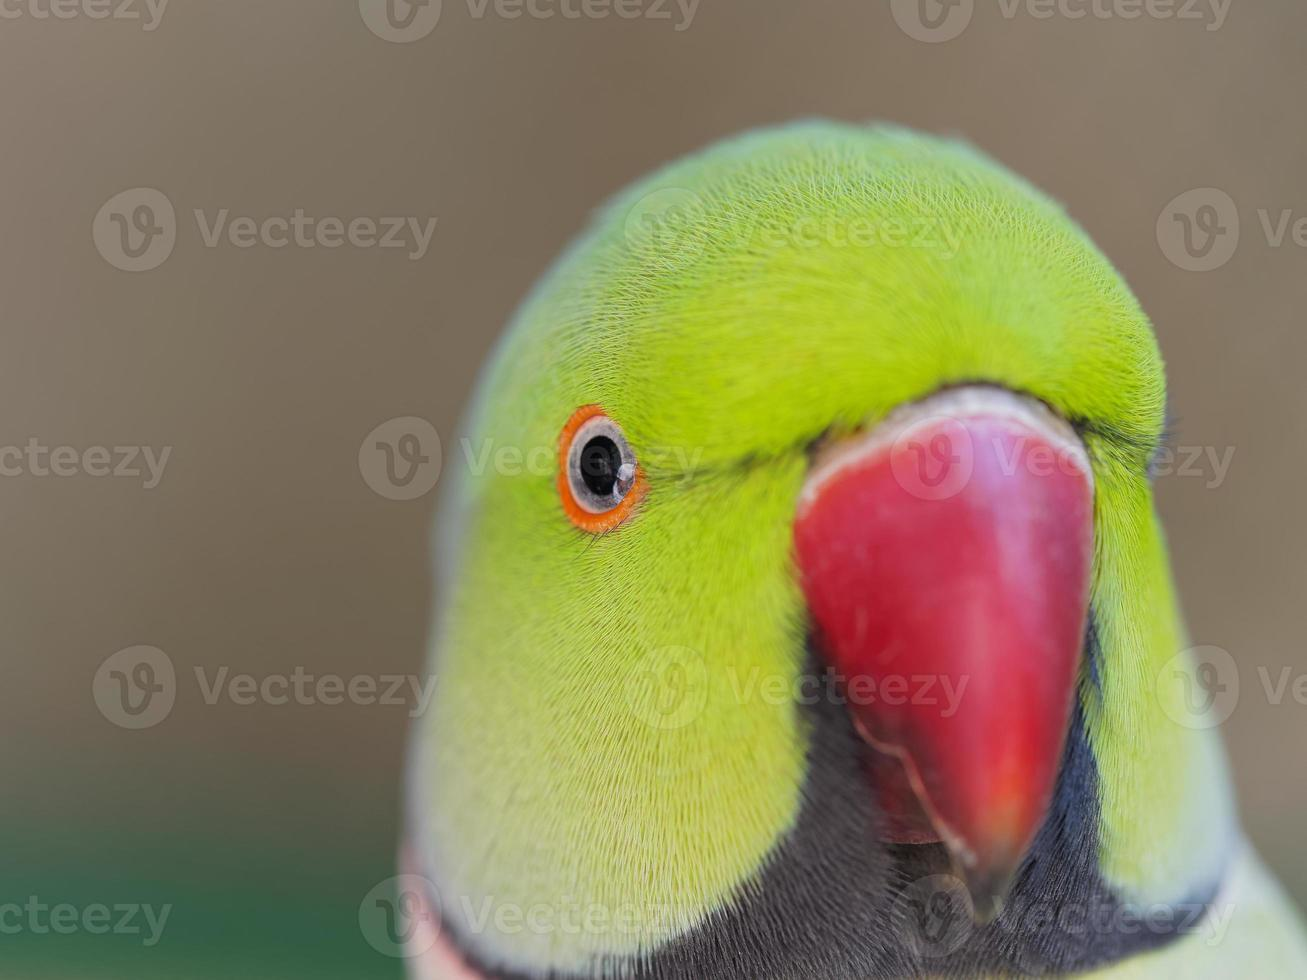 bellissimo pappagallo rosso beek foto